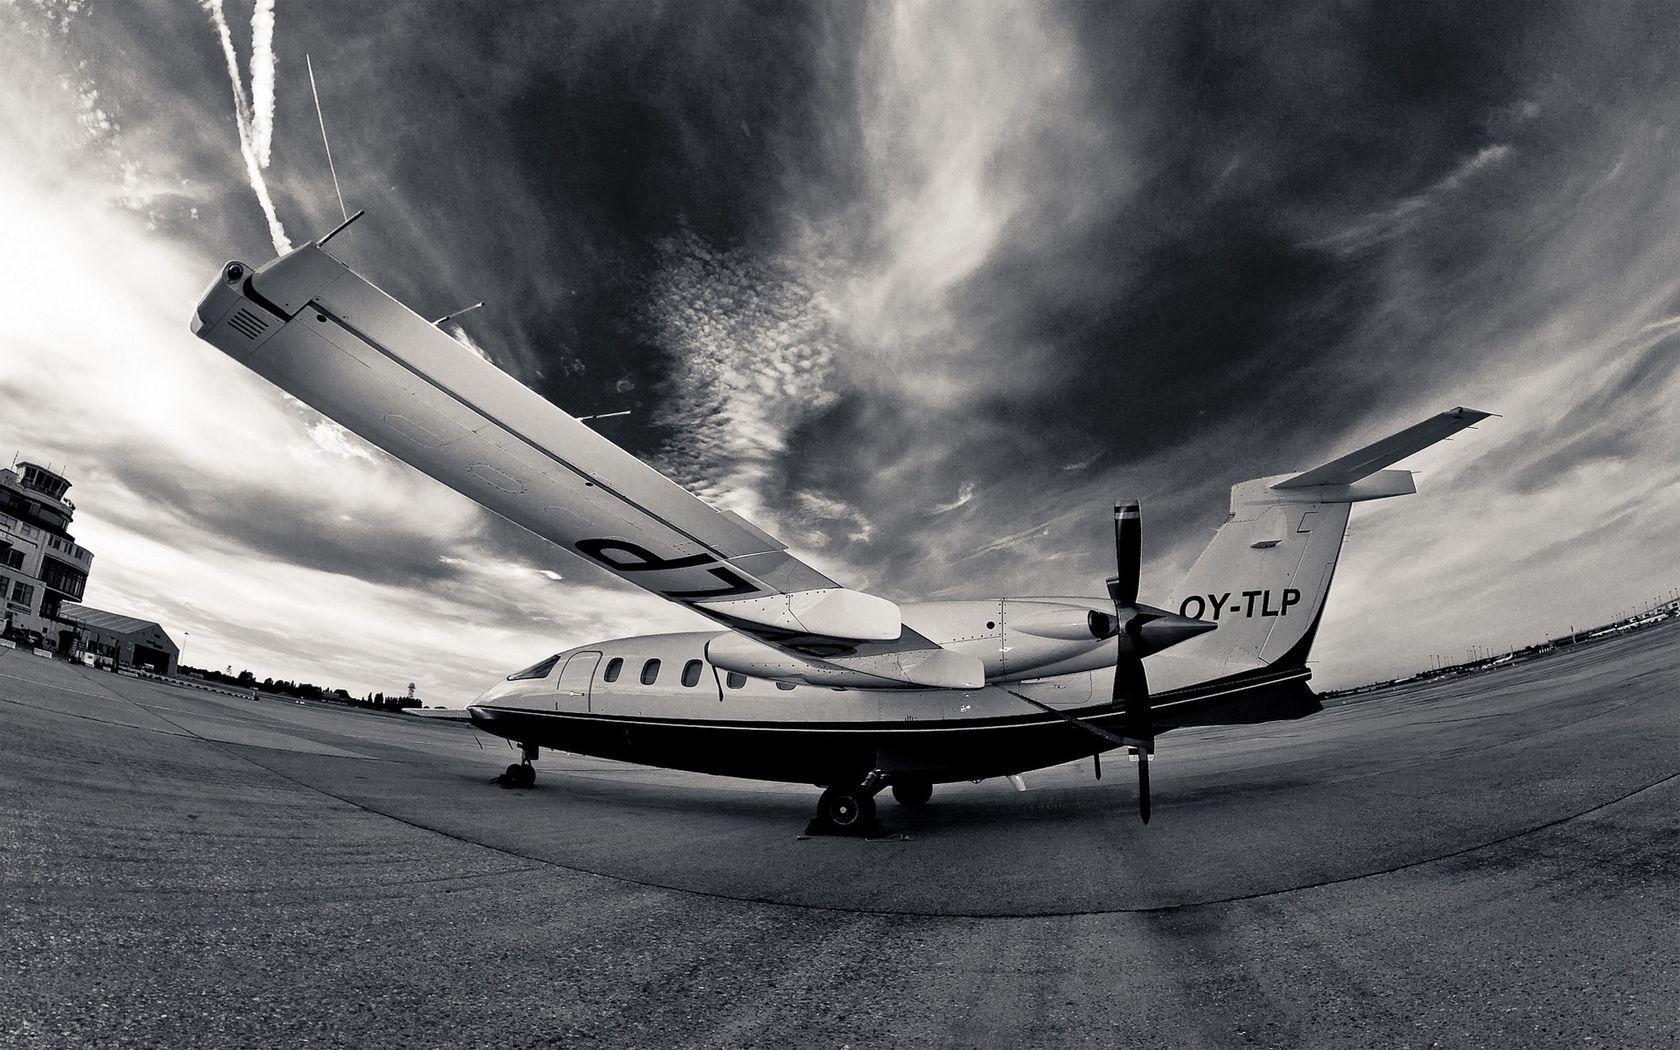 The Plane Bw